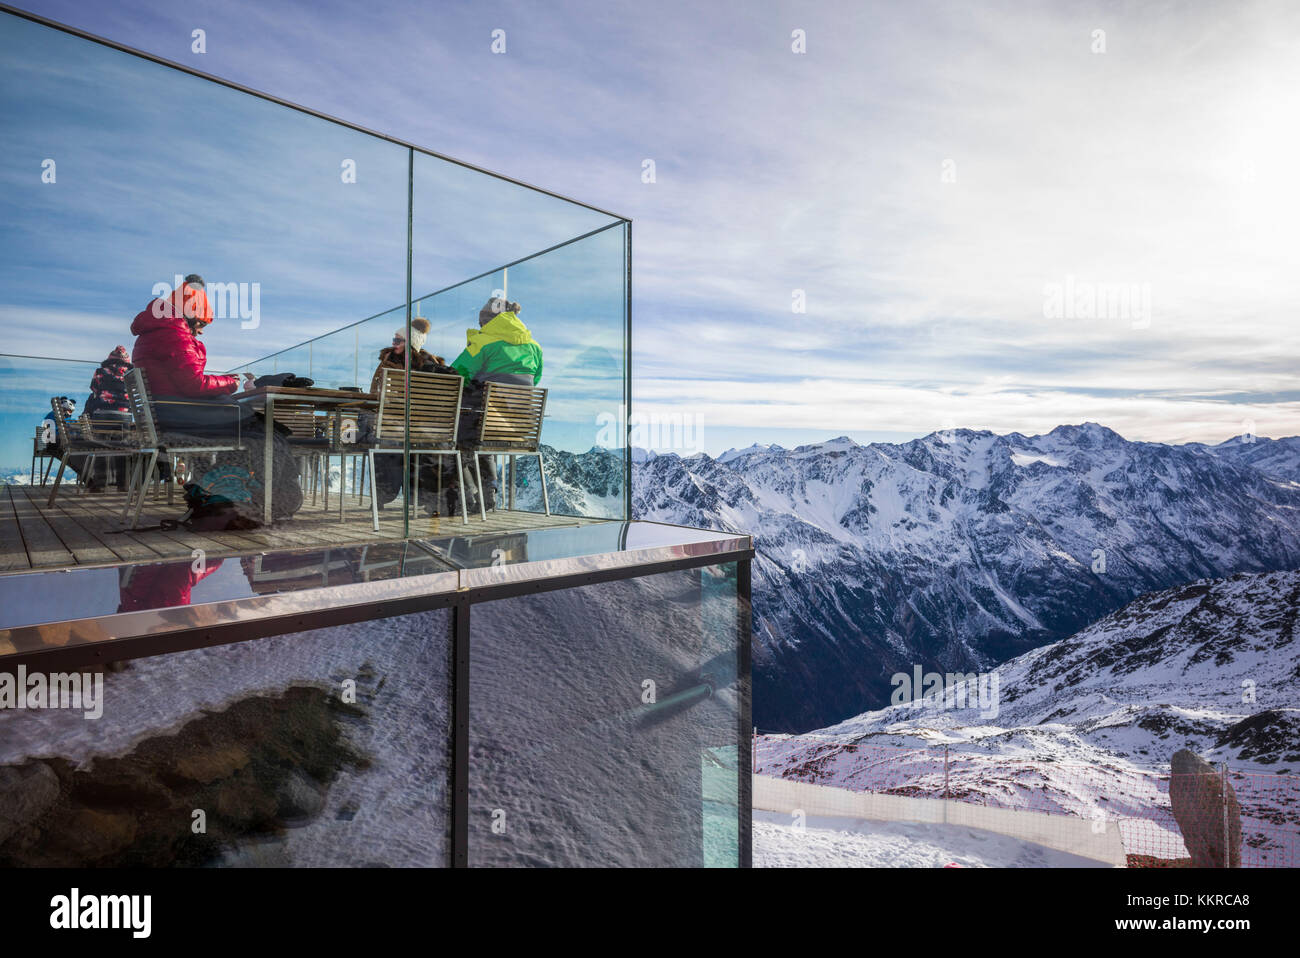 Austria, Tirol, otztal, solden, esquí de montaña, gaislachkogl gaislachkogl cumbre, altitud 3058 metros, Imagen De Stock